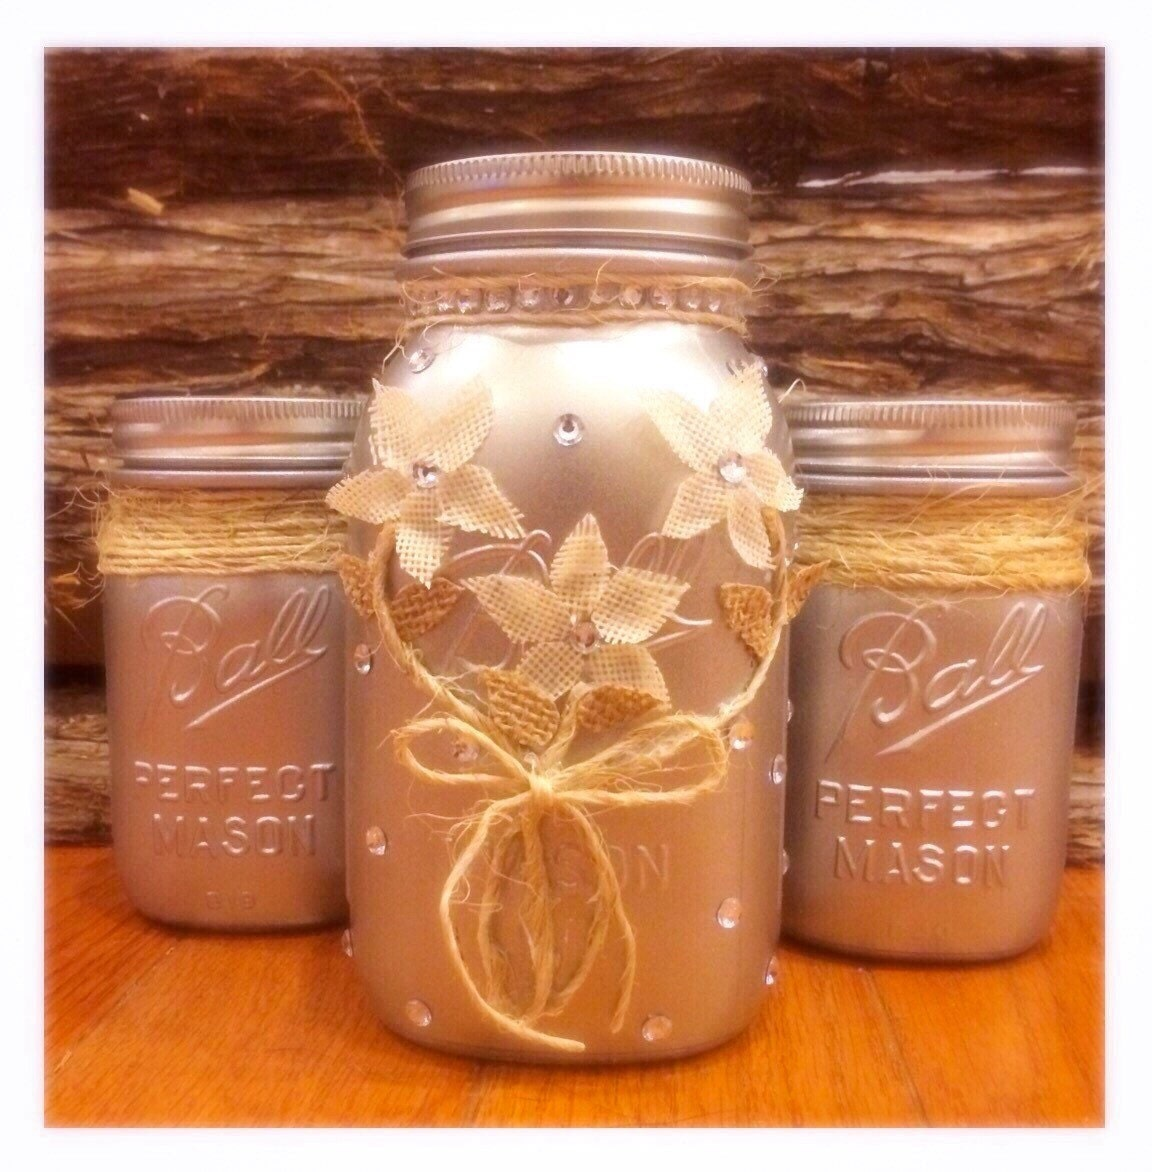 Rustic Jars For Wedding: Silver Mason Jars Rustic Wedding Mason Jar Centerpiece